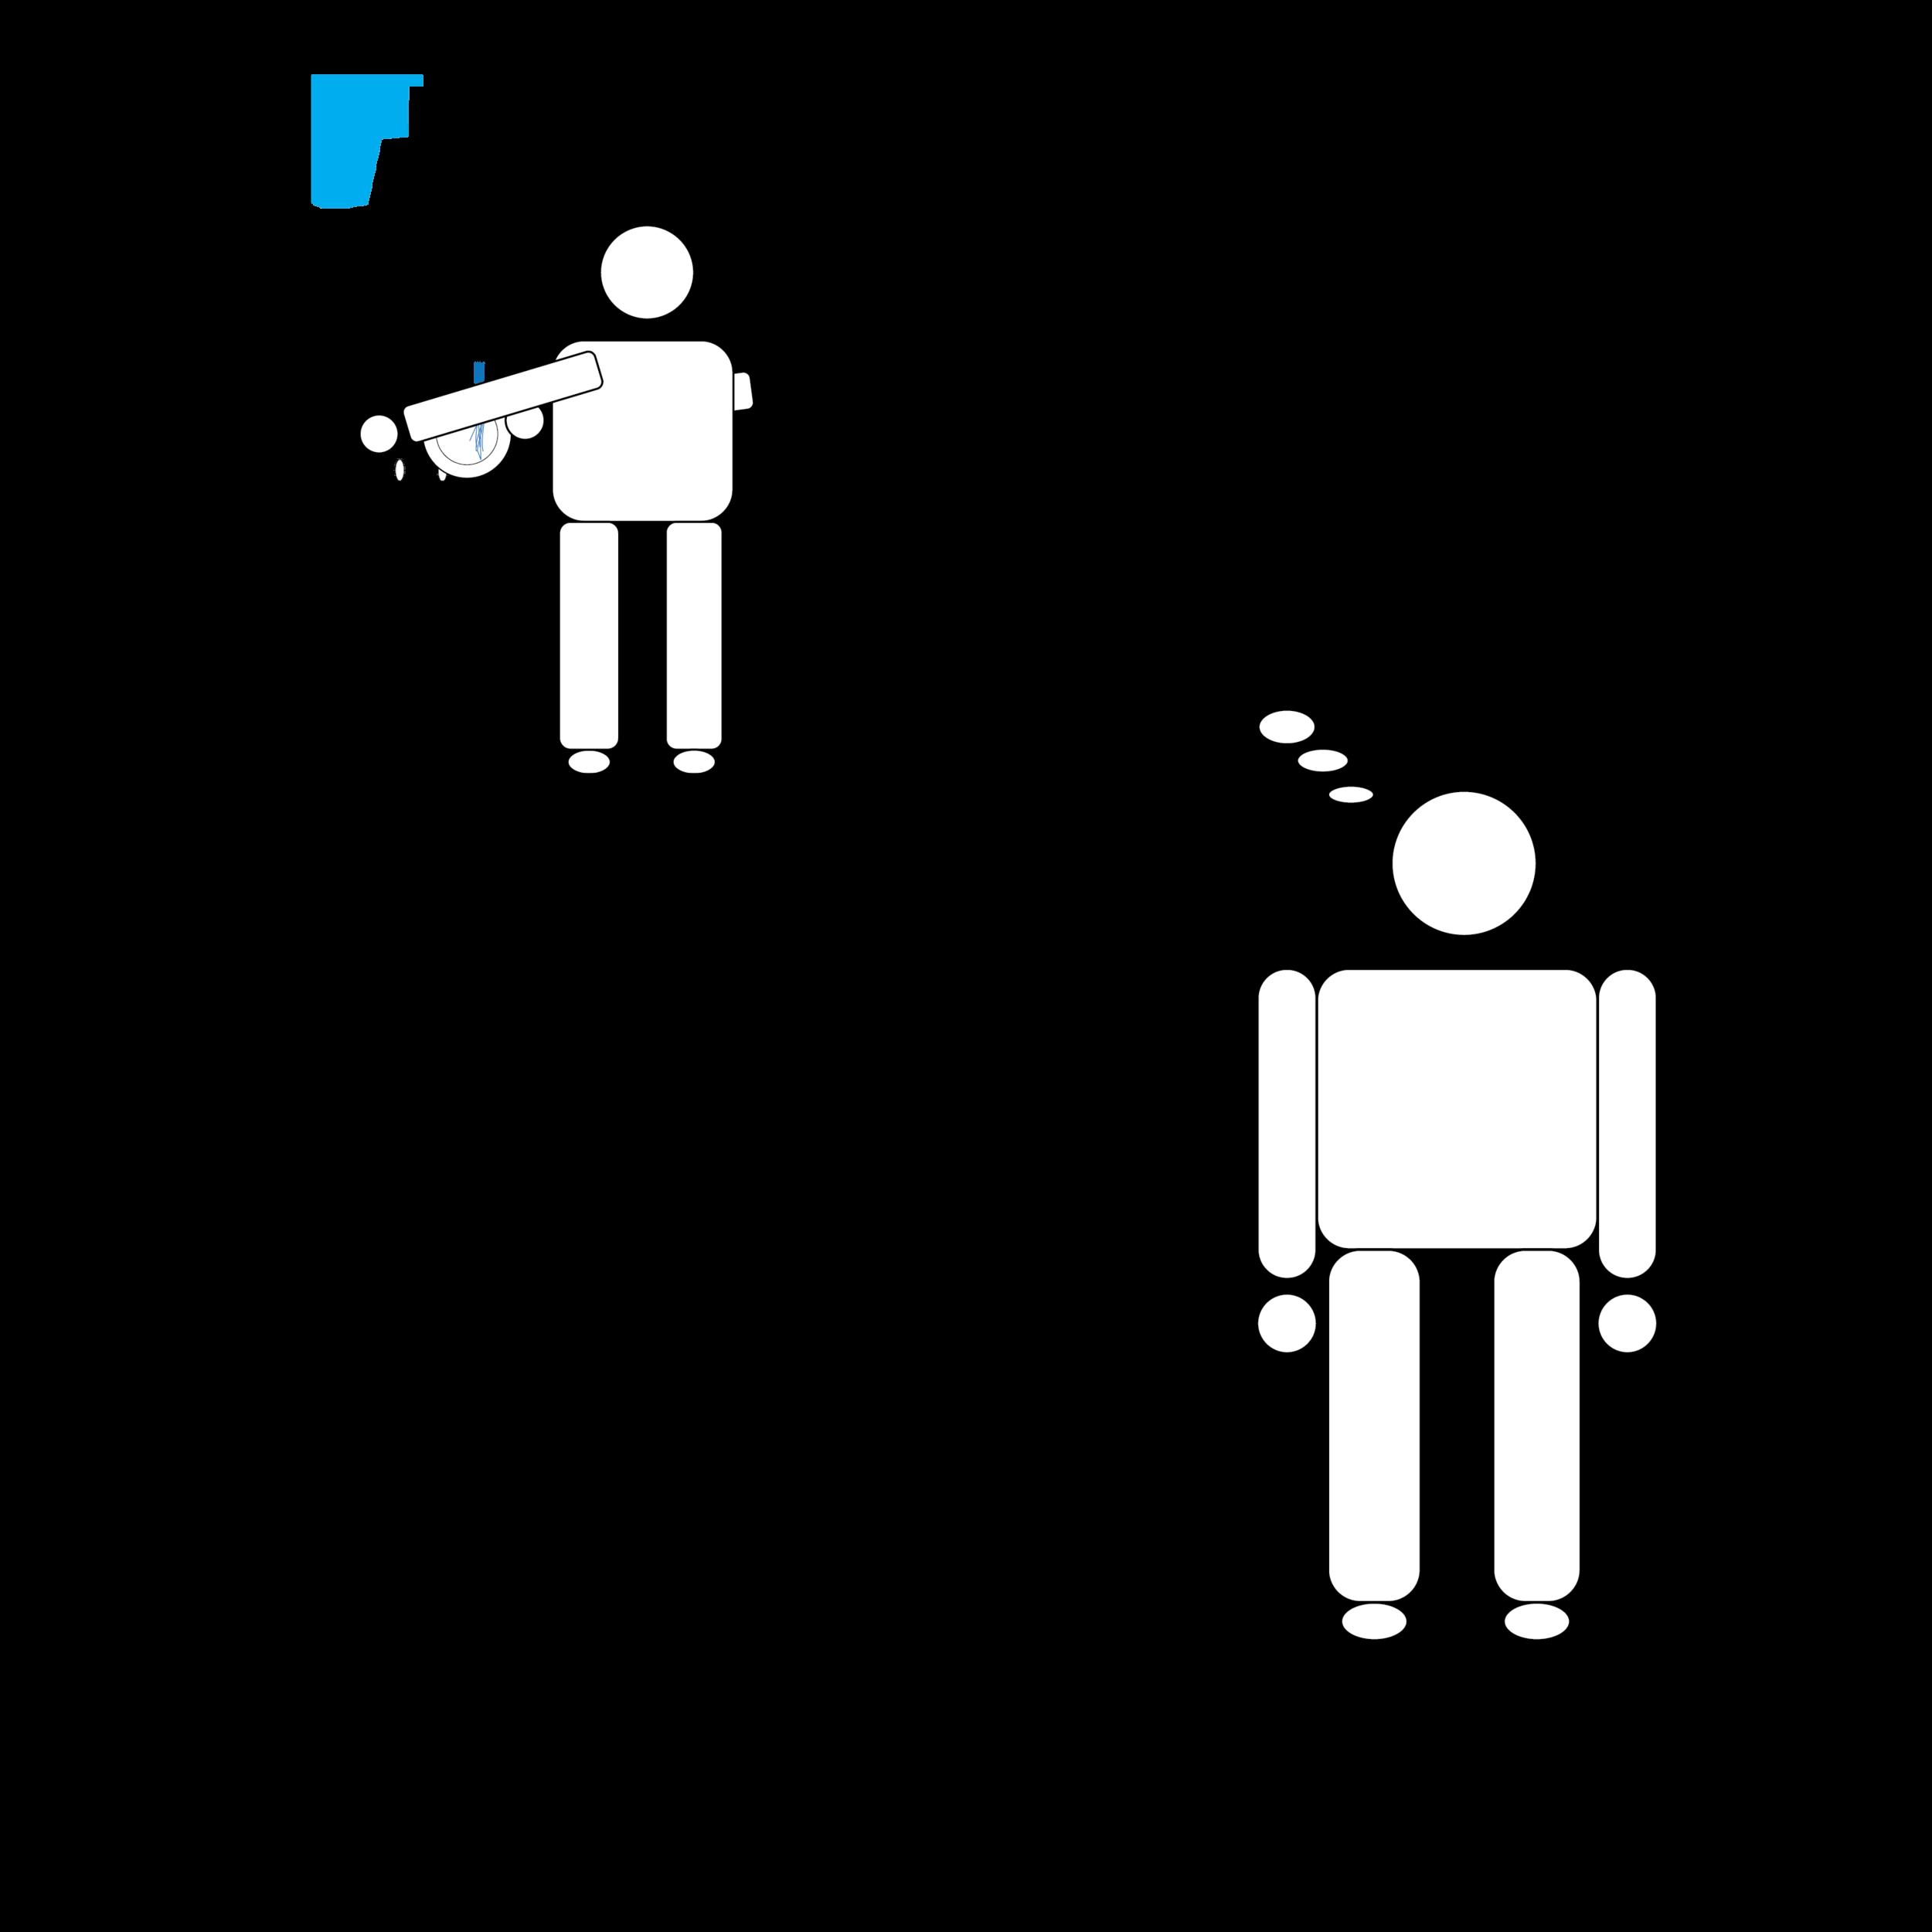 skyshapes-diagram-step2.png